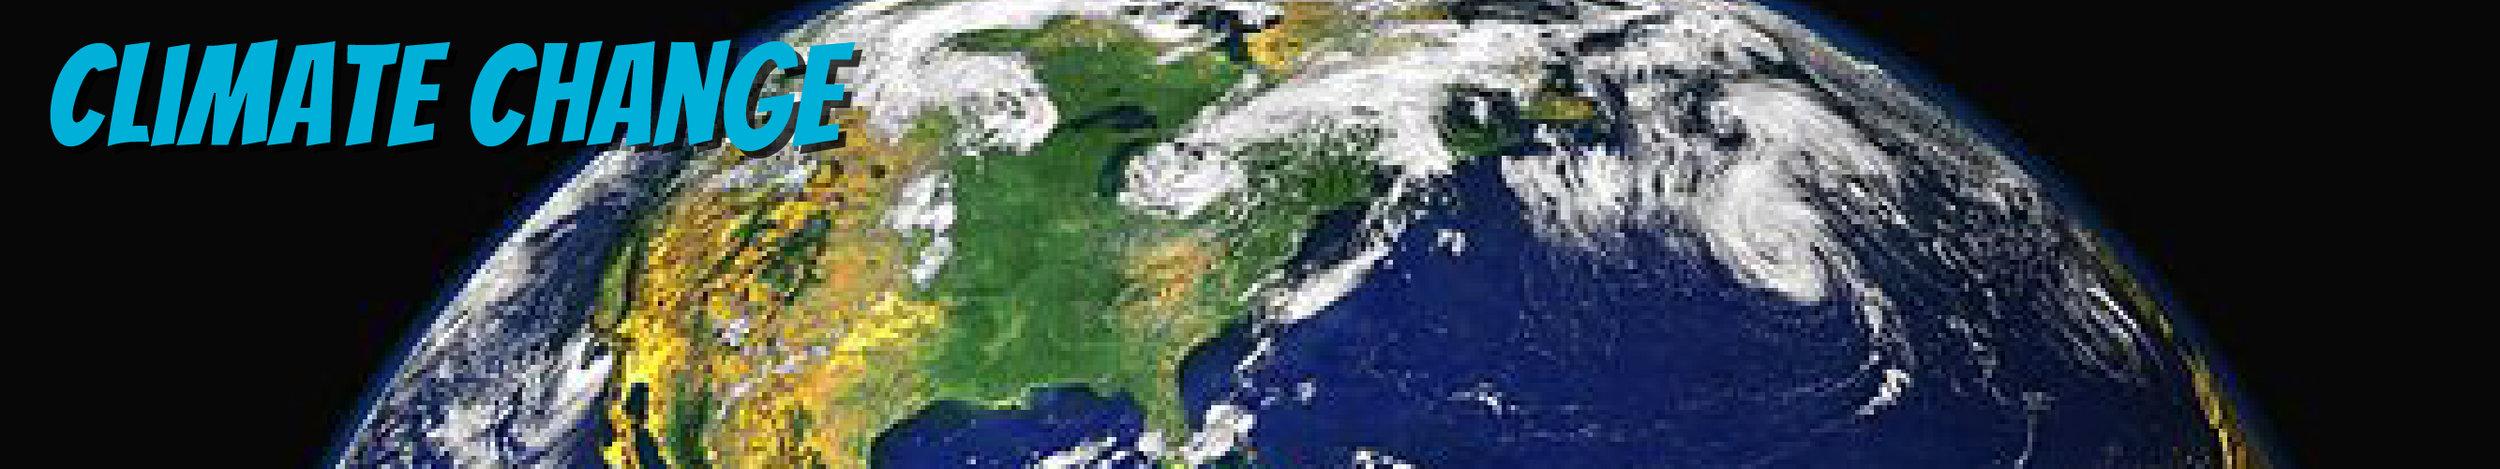 LATI-ClimateChange-Text-01.jpg